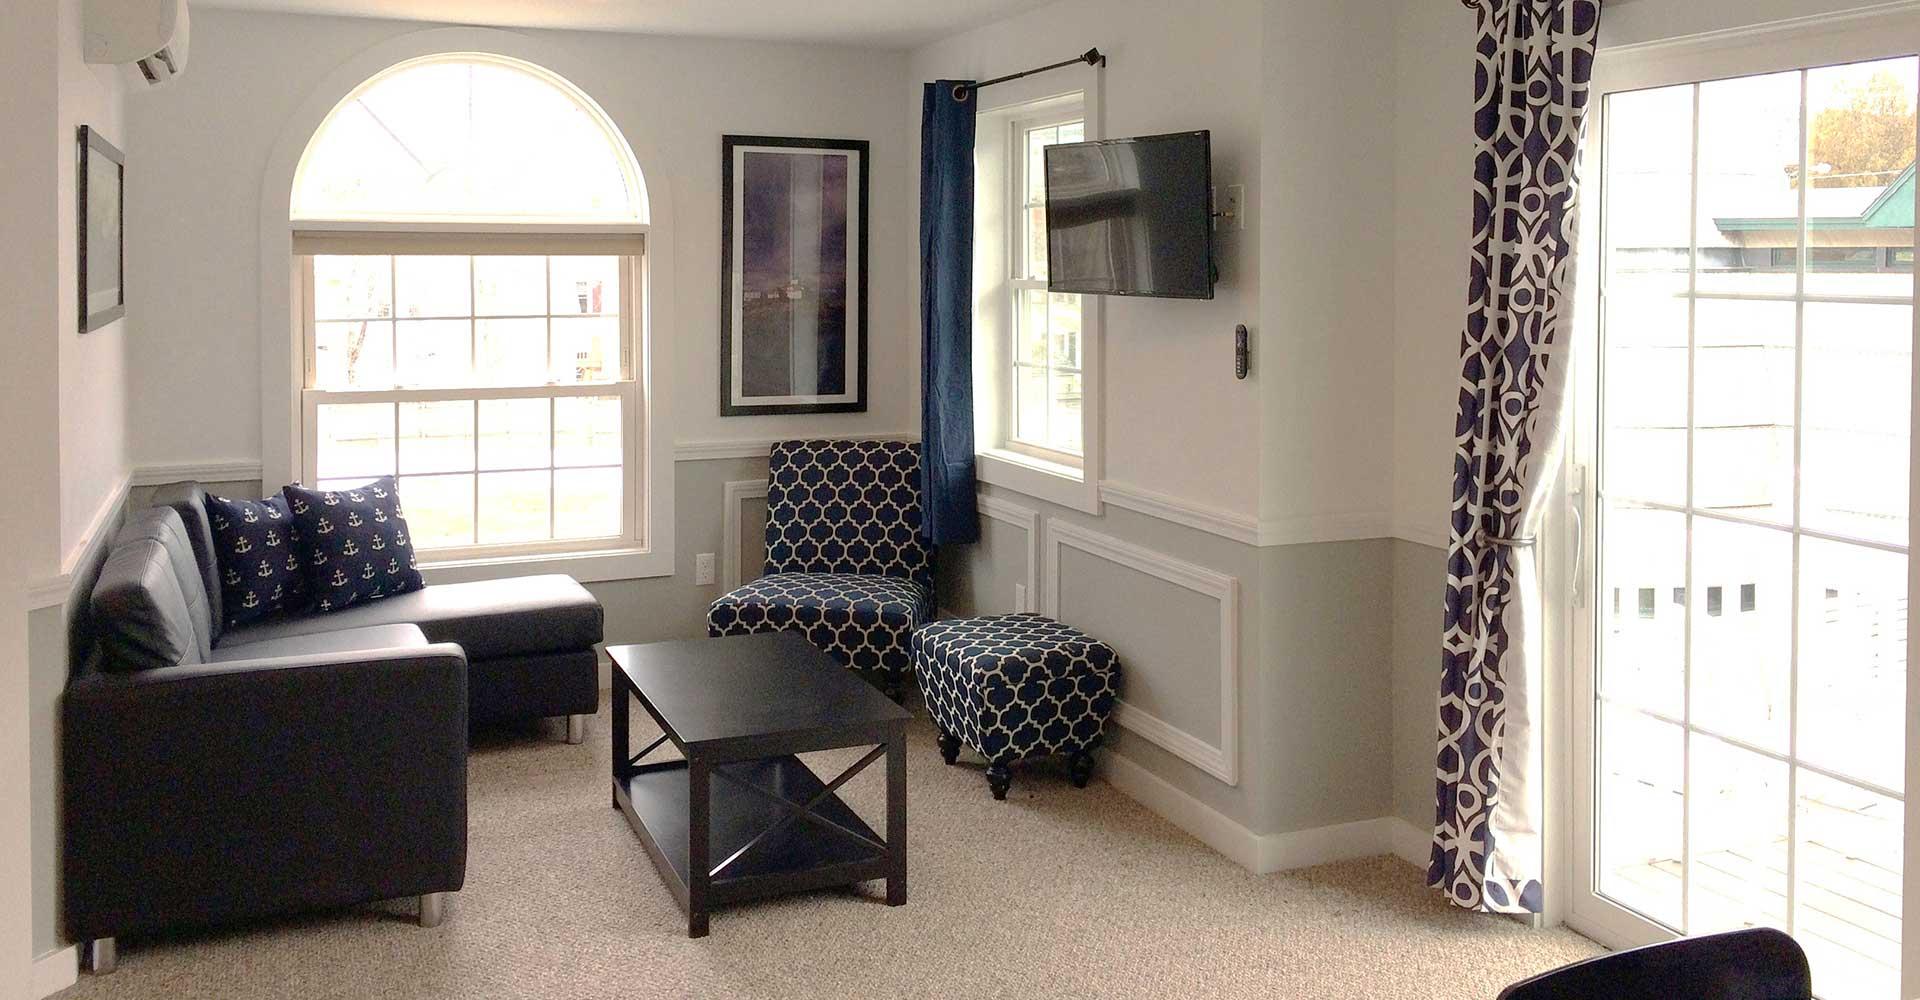 Acadia Hotel Rooms